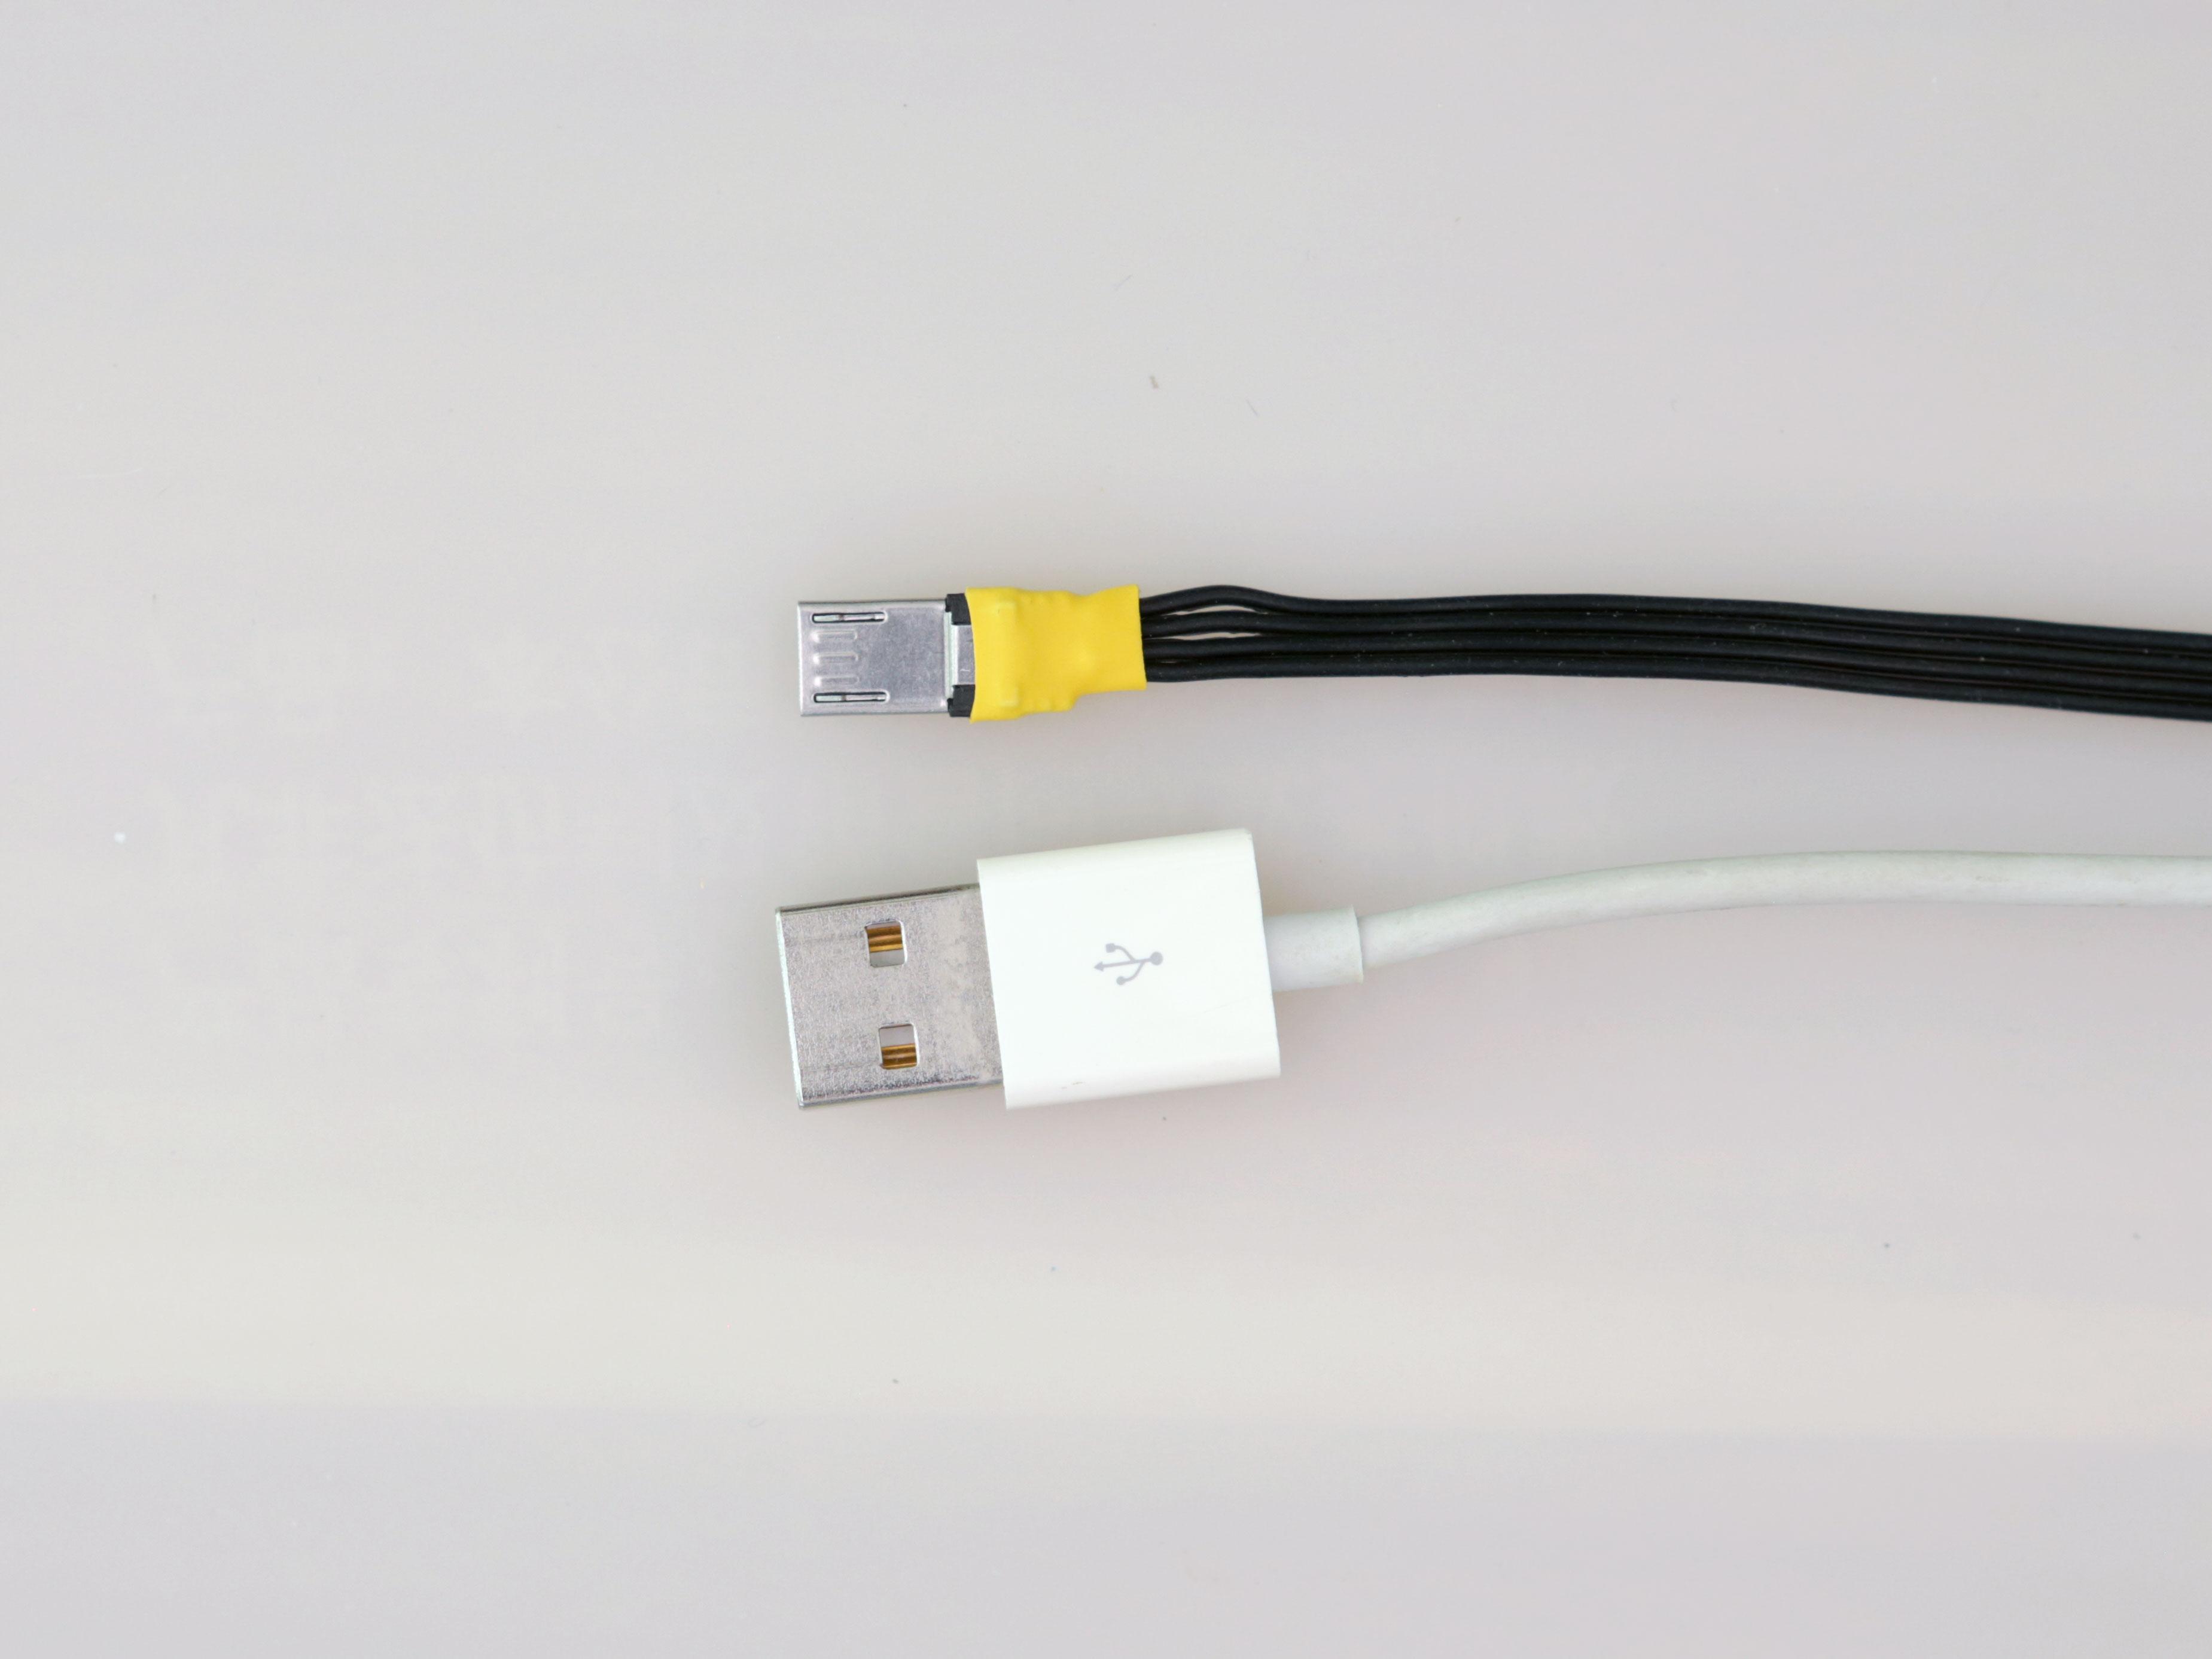 sensors_usb-diy-cable.jpg